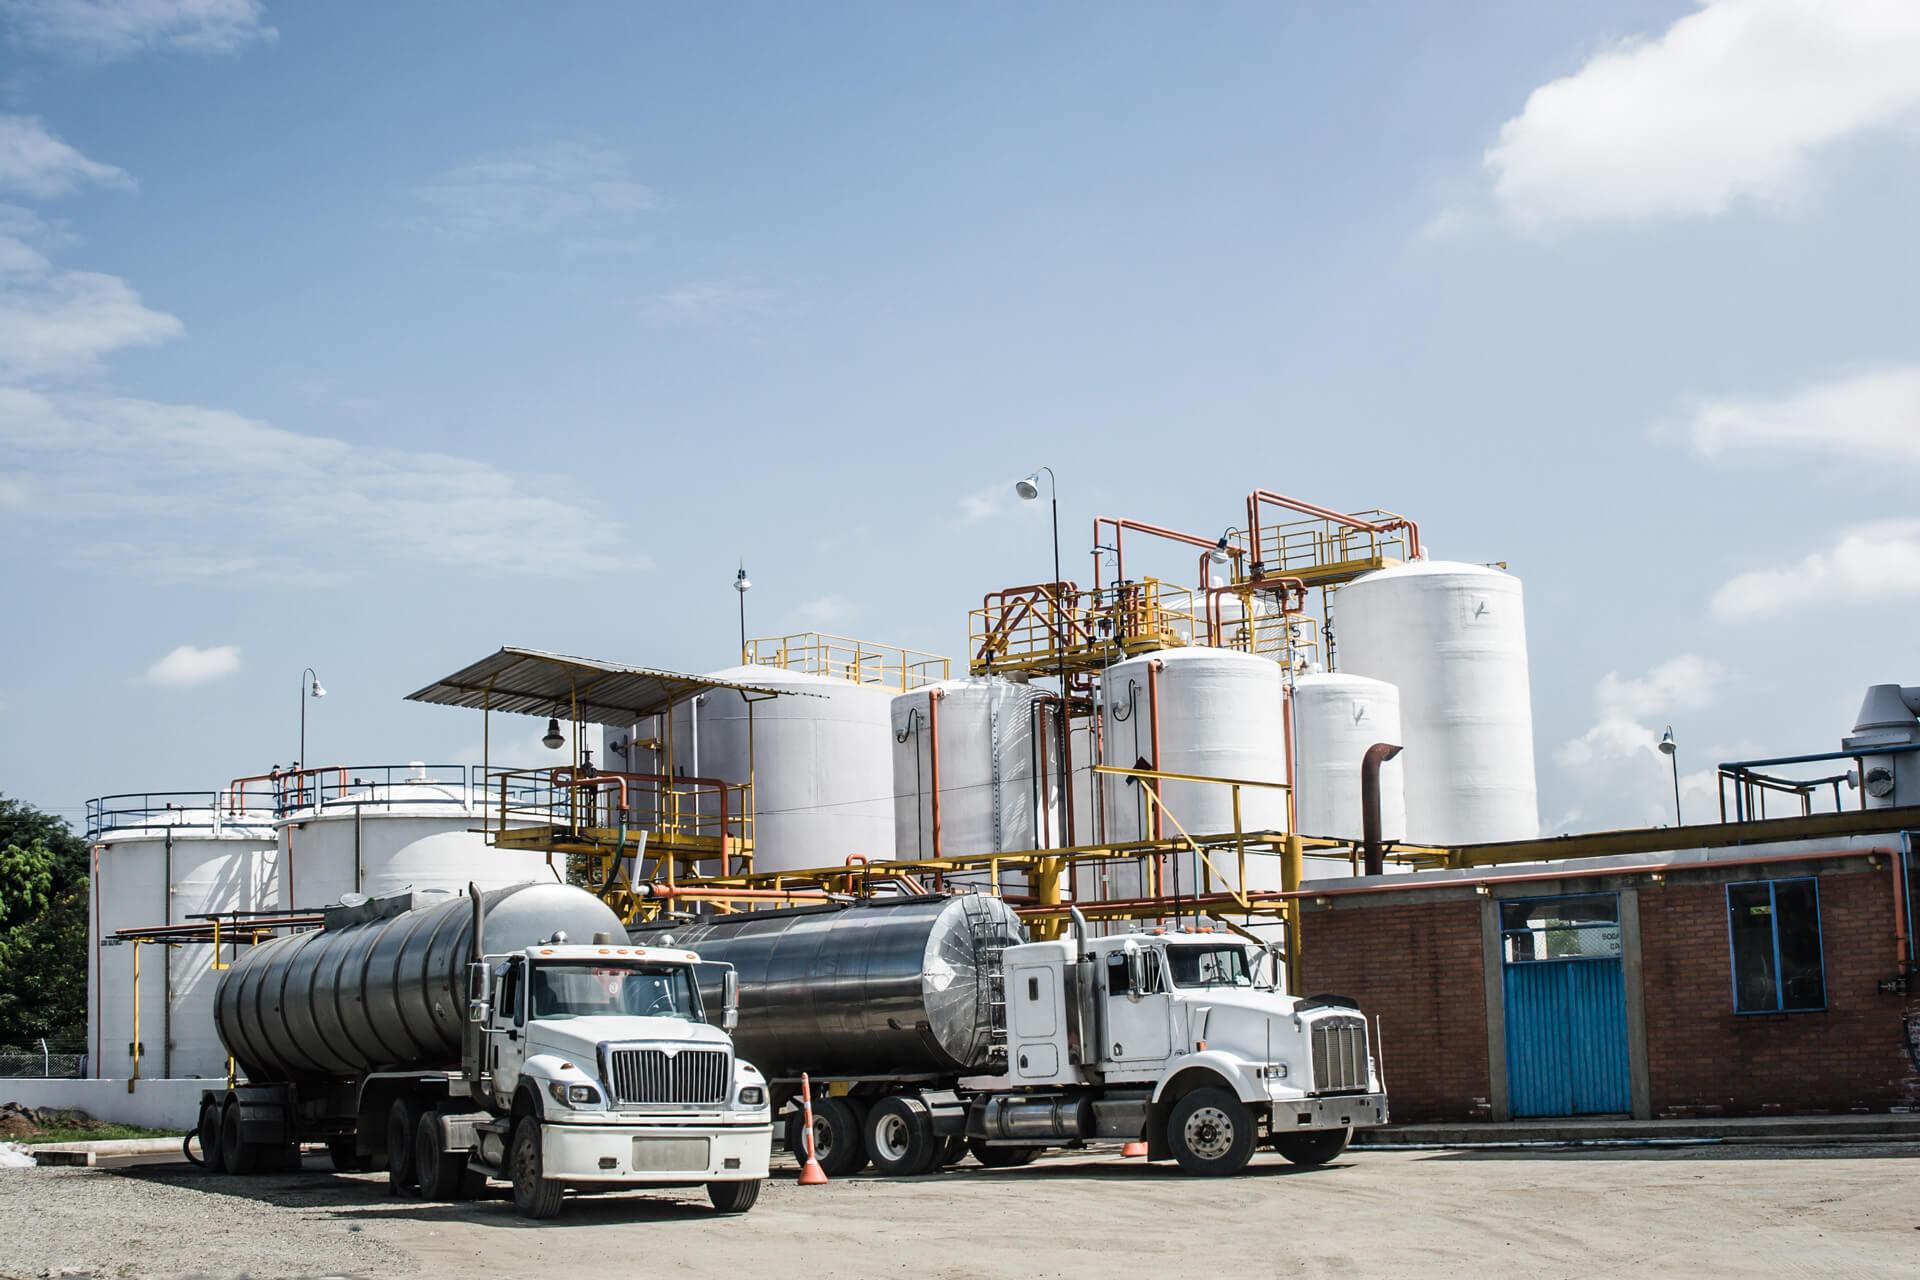 Chemical Trucking Companies